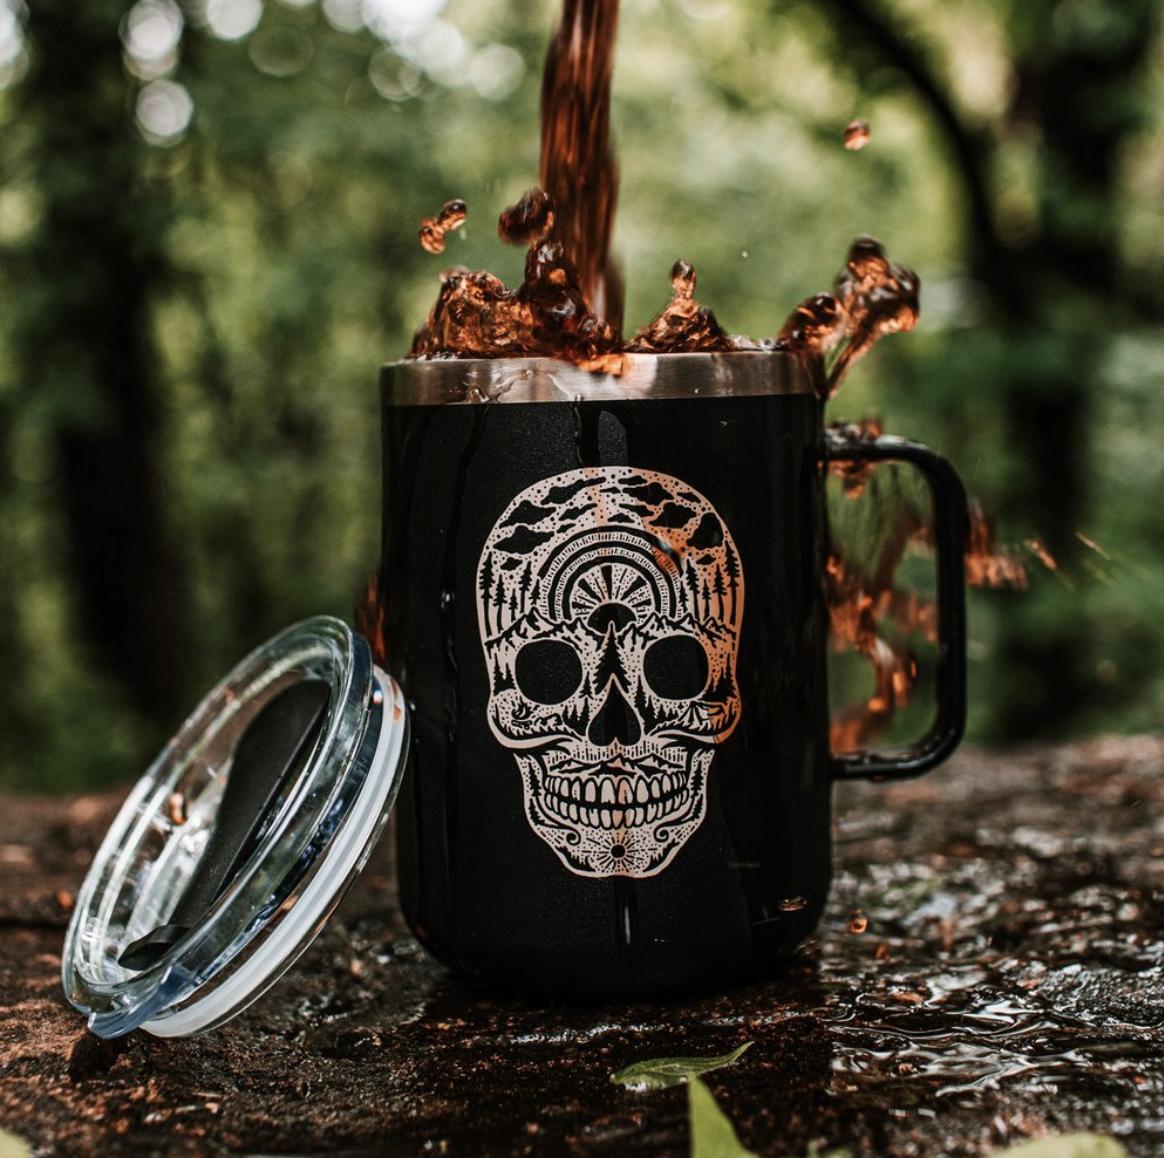 Stainless Steel Camper Mug - Choose From Designs